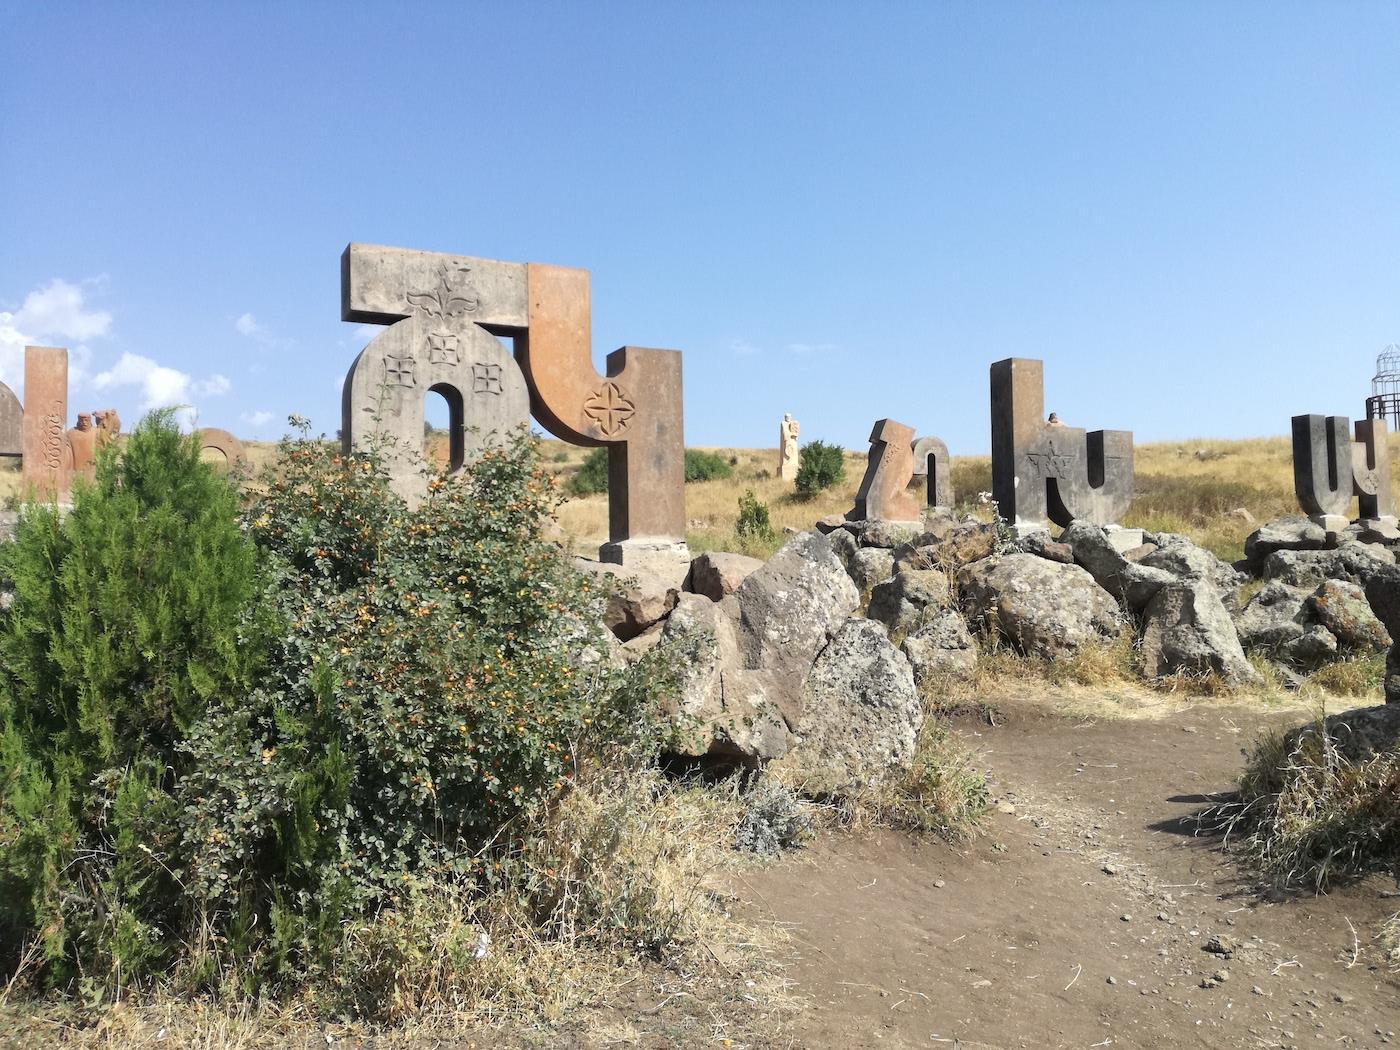 rondreis georgie armenie azerbeidzjan plannen